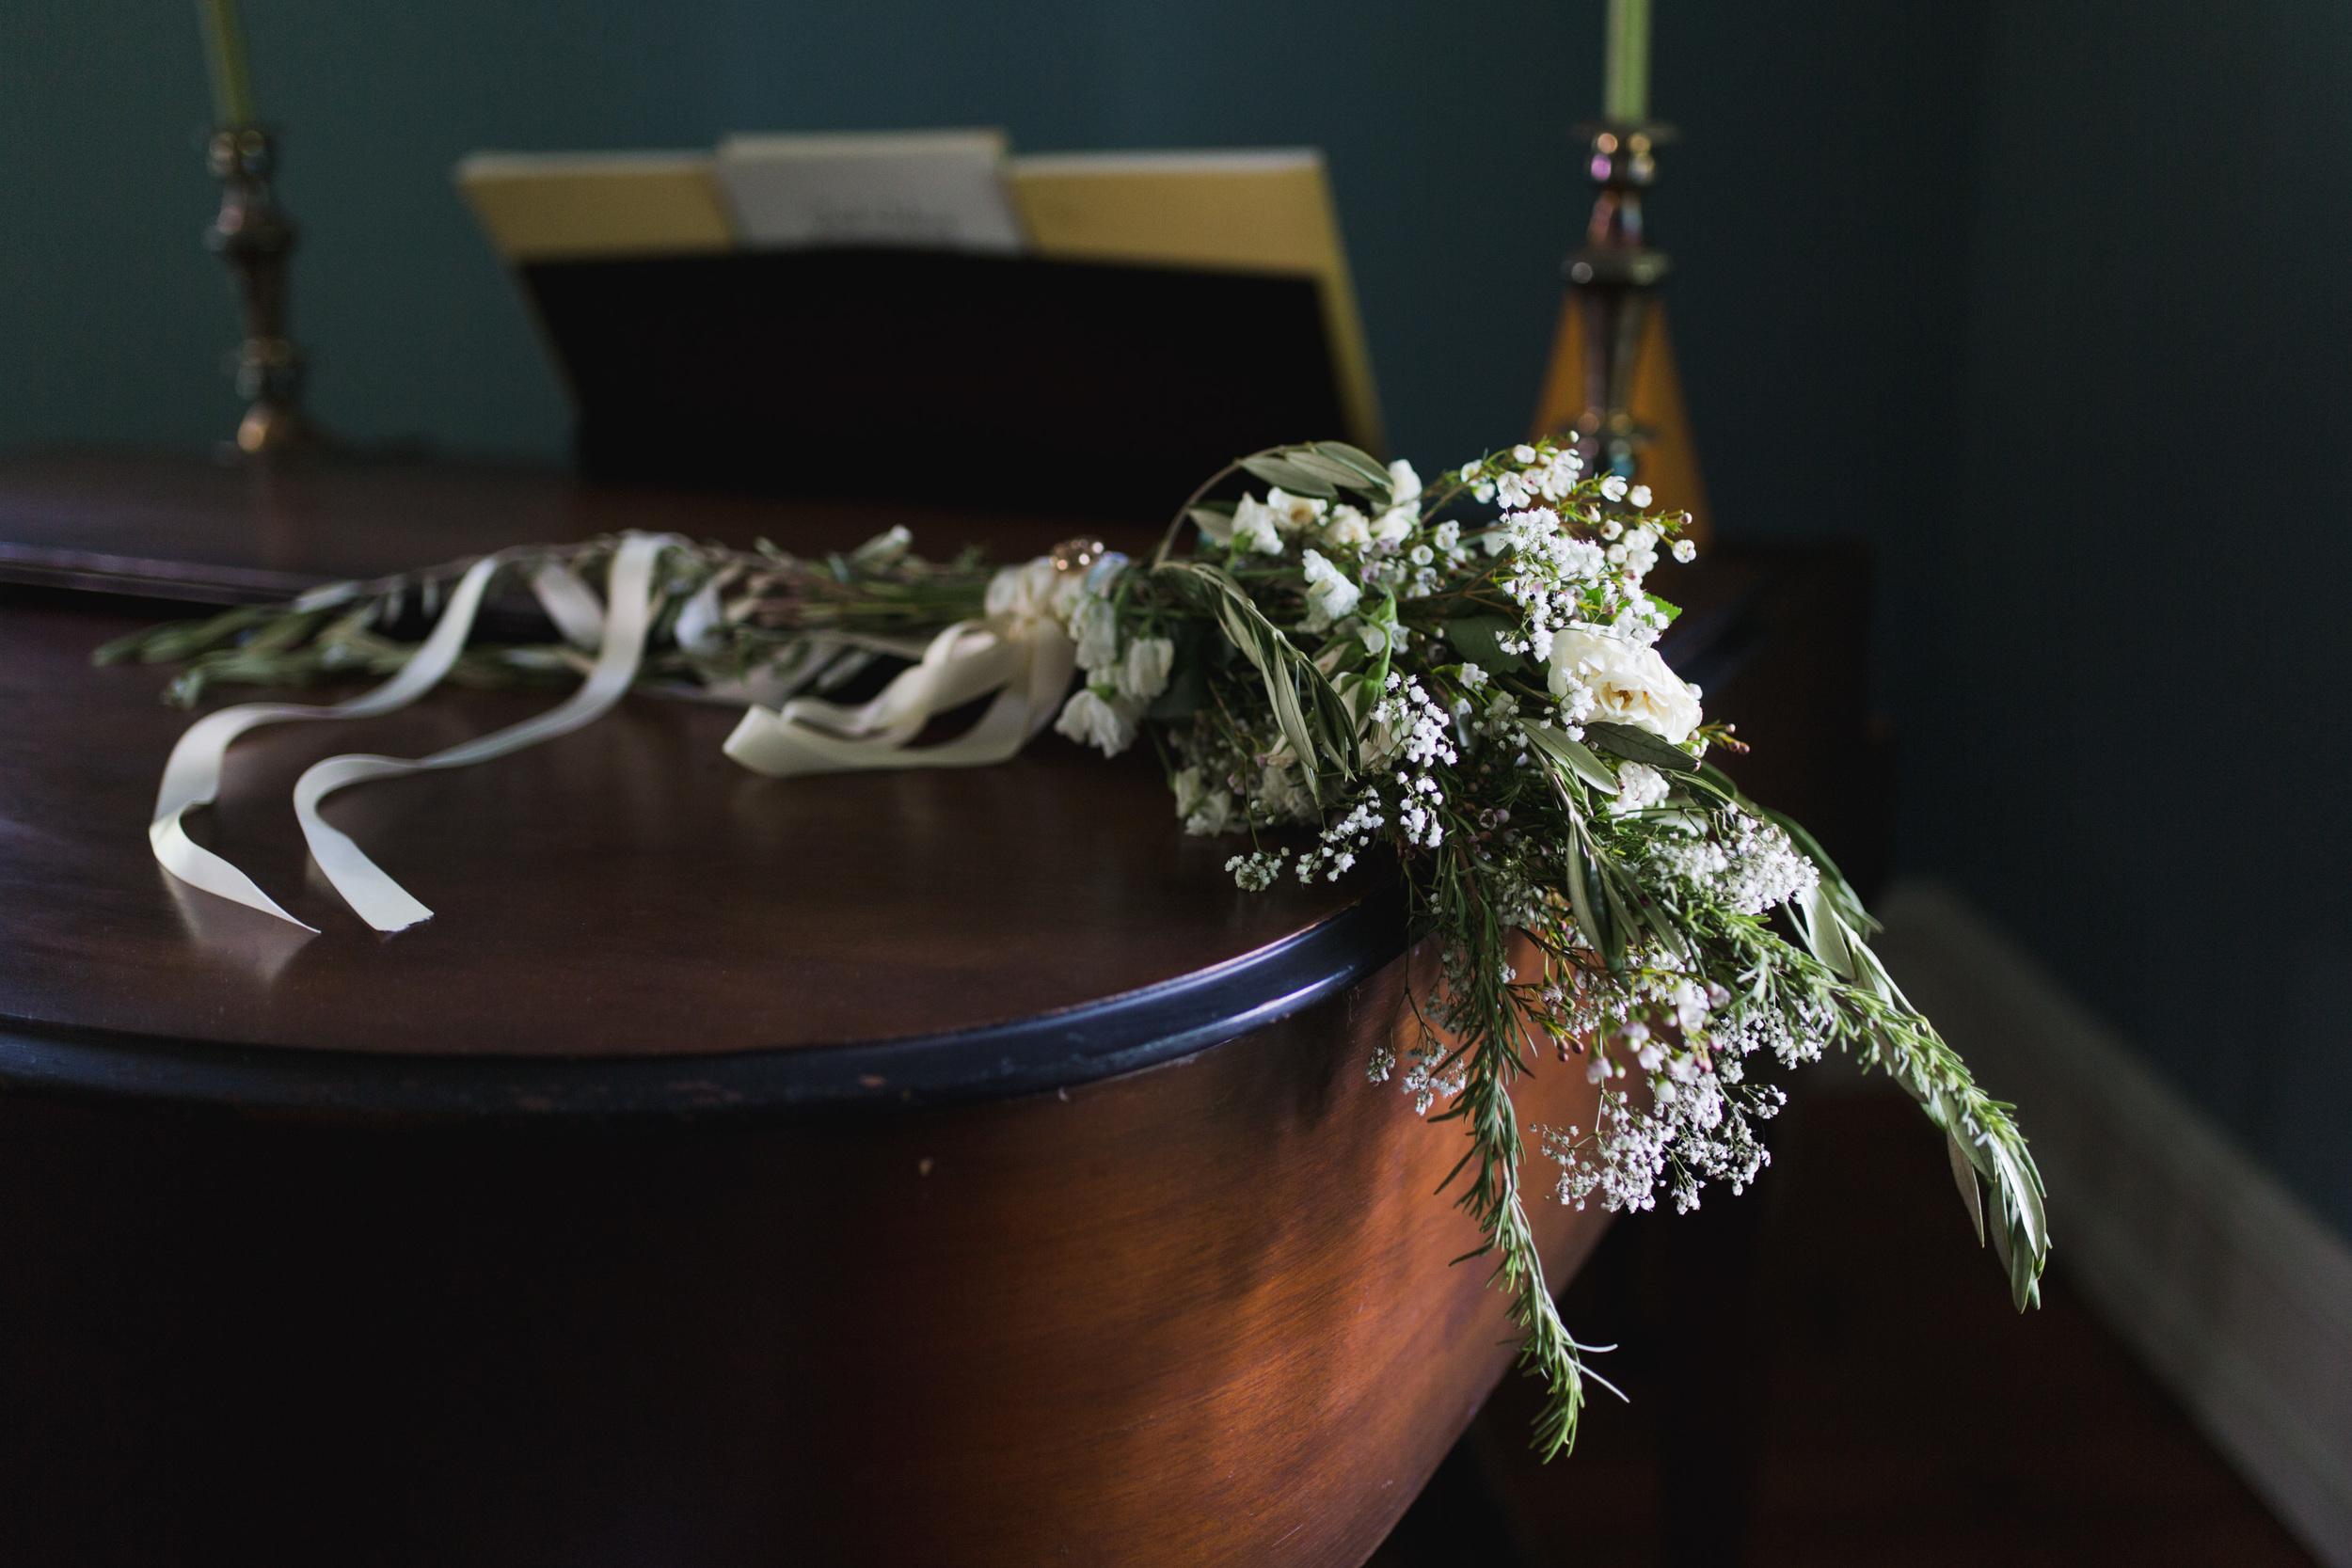 pennsylvaniapaweddingphotographersphotographyflowerbouquetolive